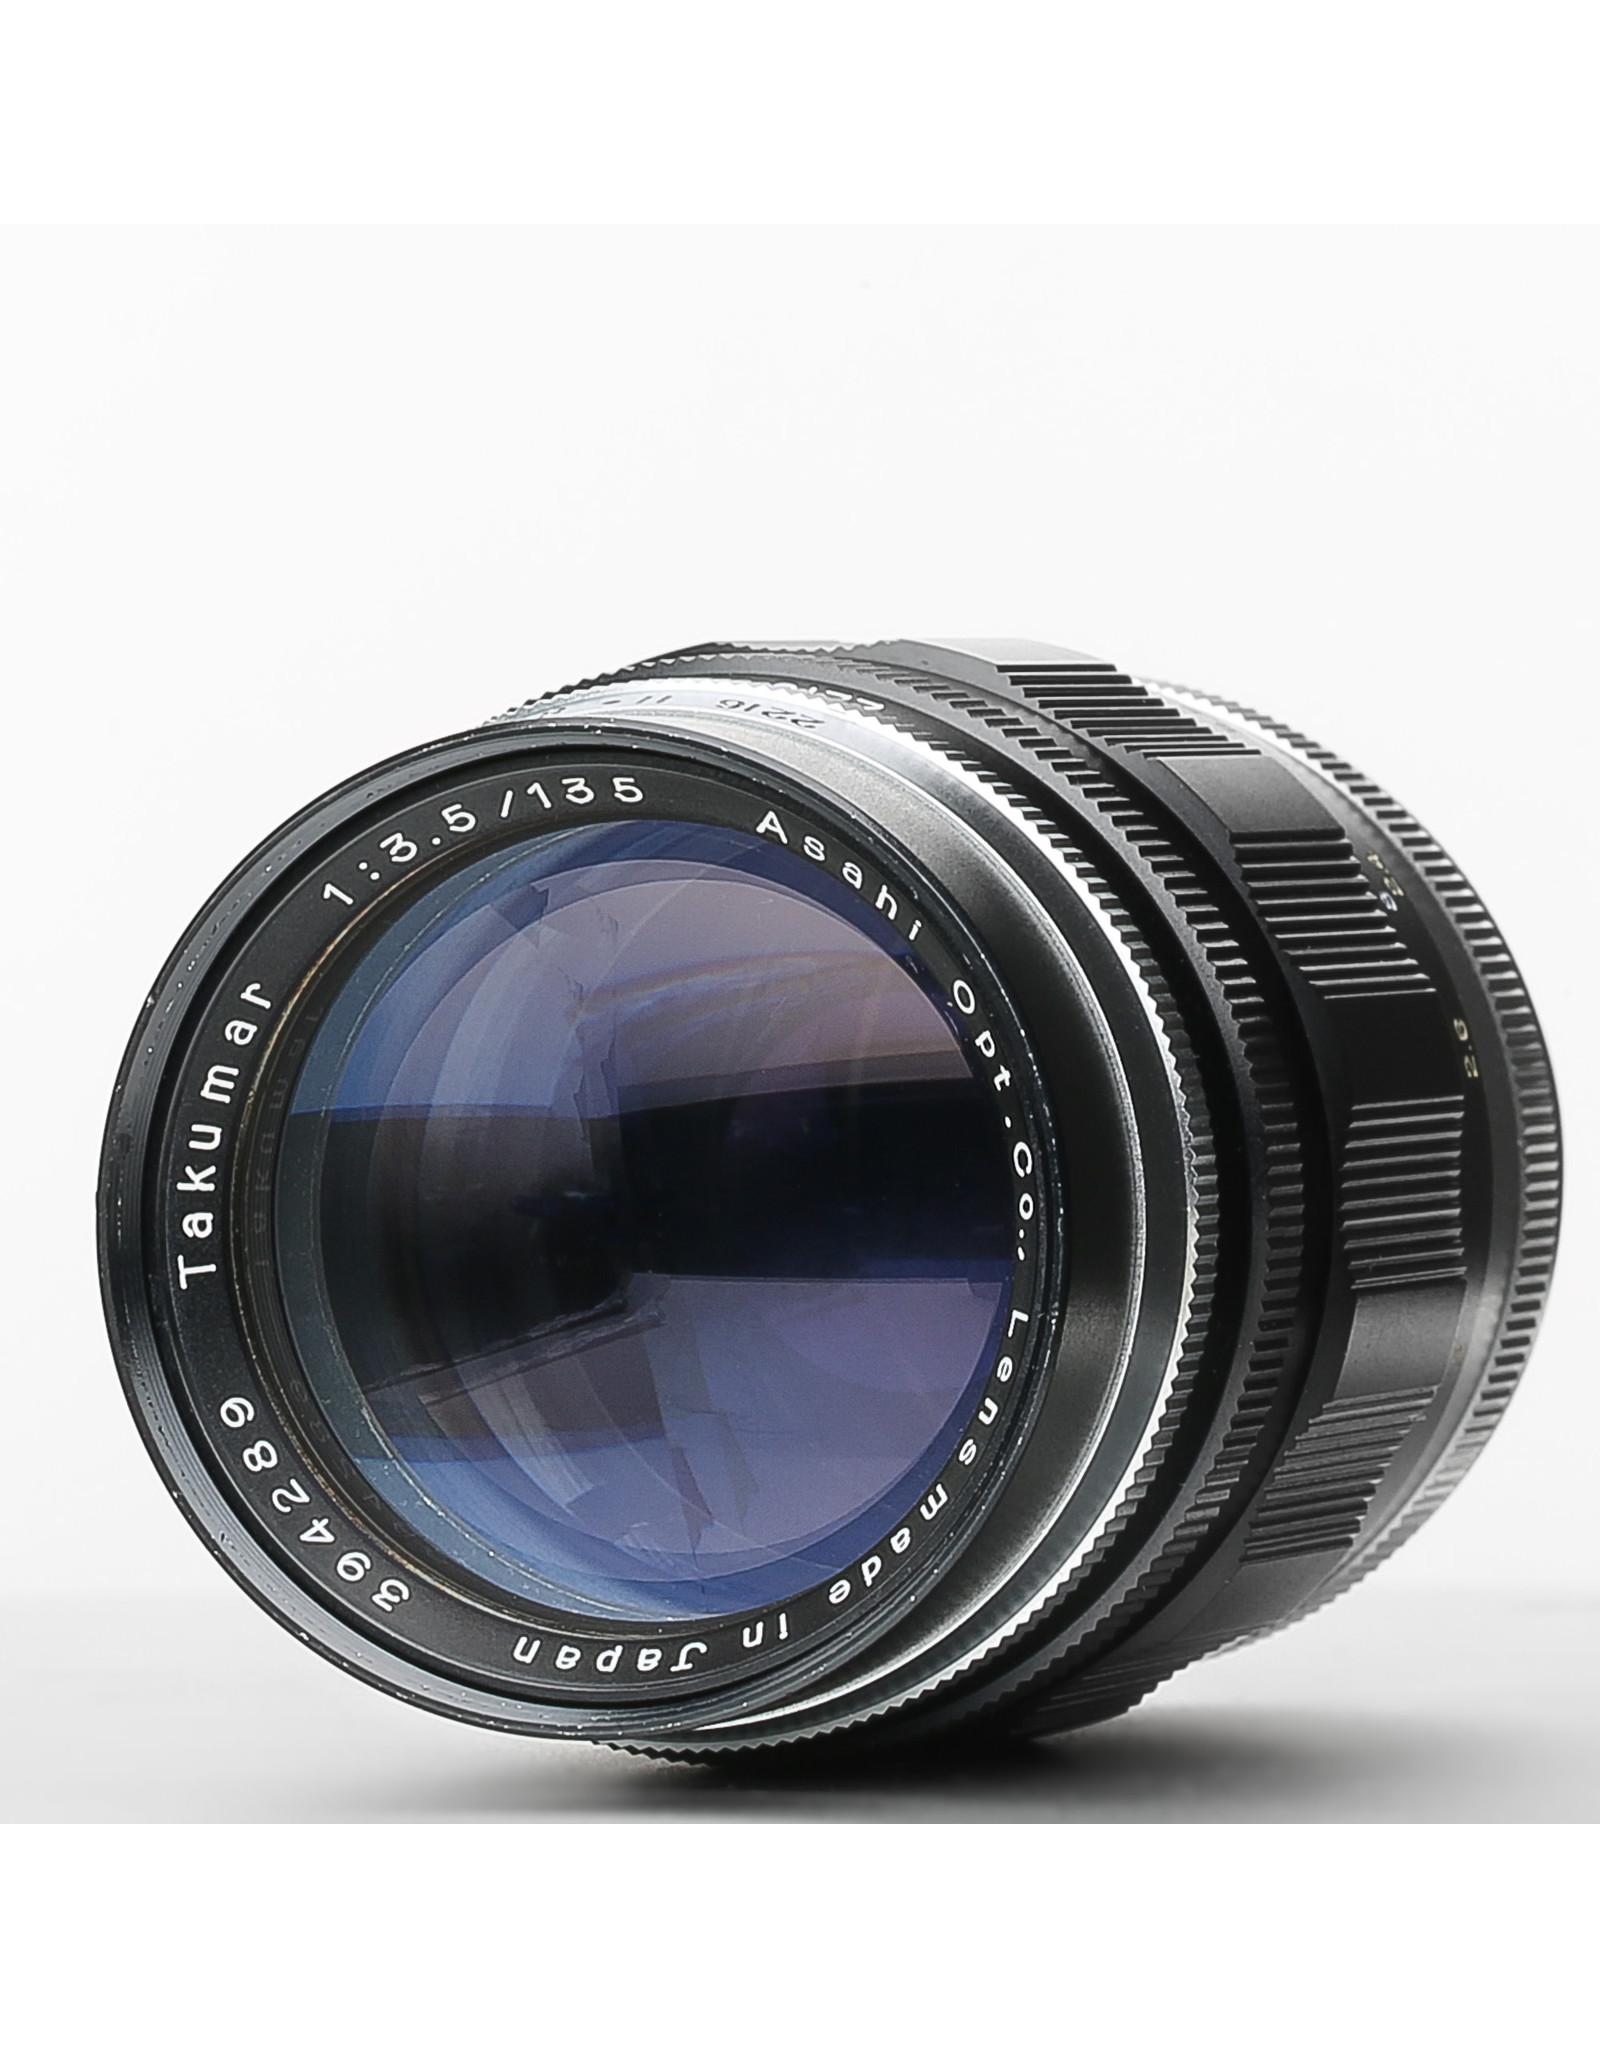 Pentax Pentax Takumar 135mm f3.5 M42 Lens (early)